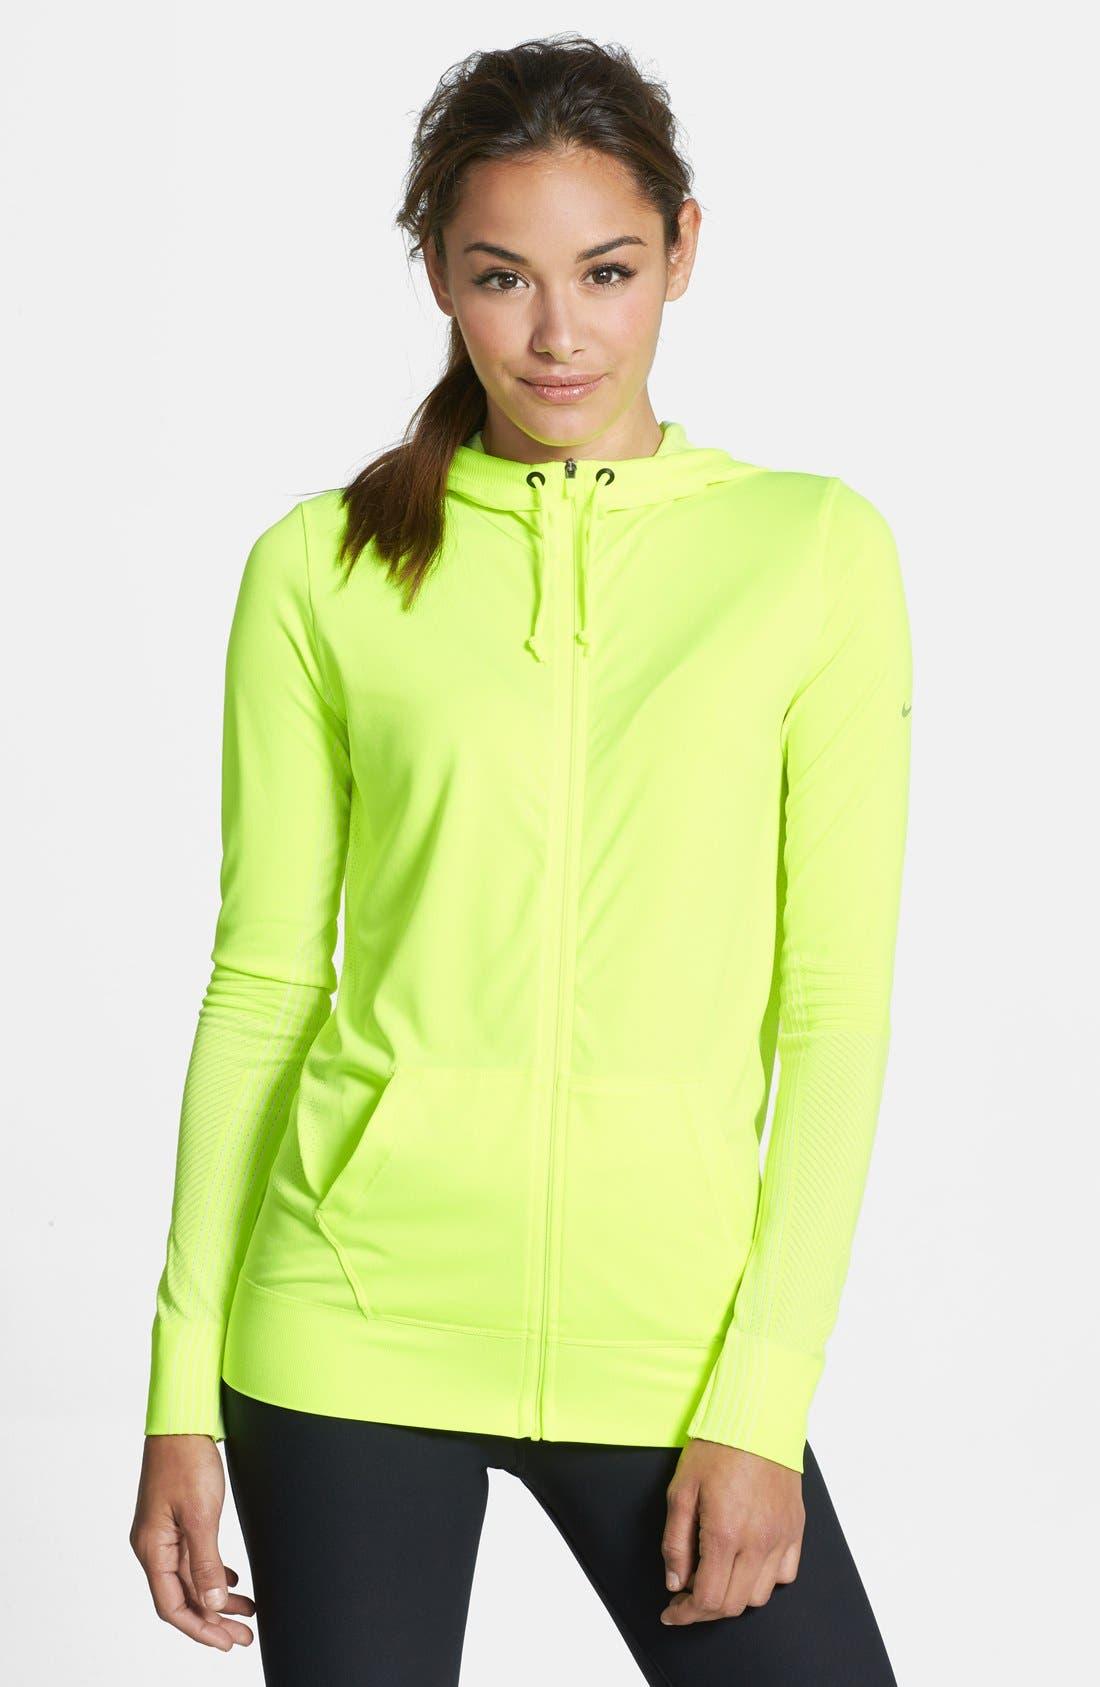 Alternate Image 1 Selected - Nike 'Epic' Dri-FIT Knit Hoodie